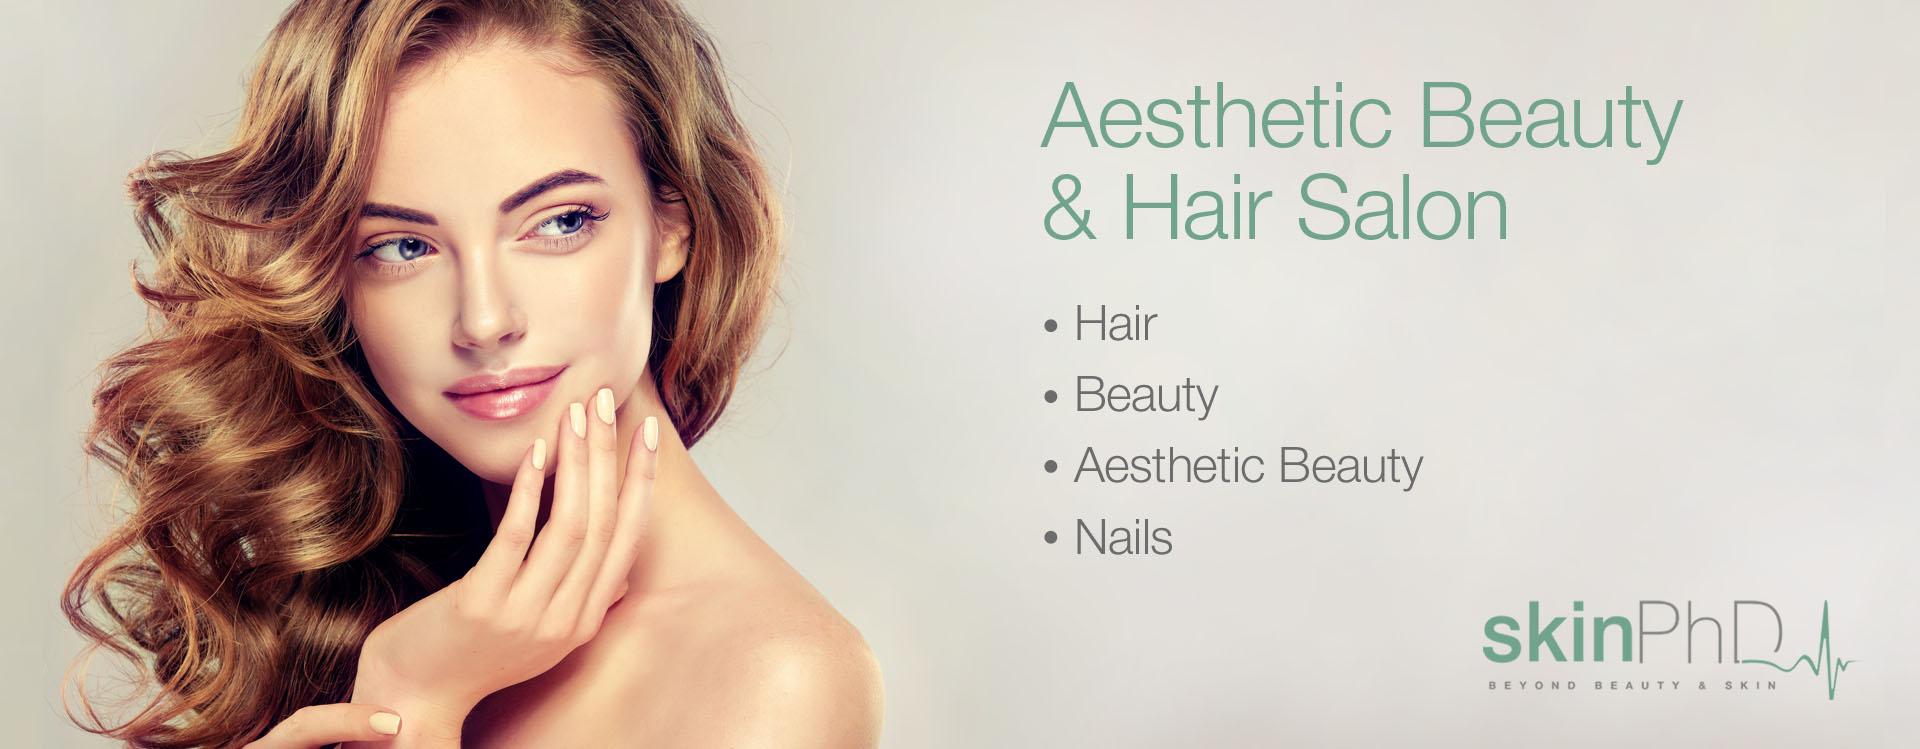 SkinPhD Salon.jpg